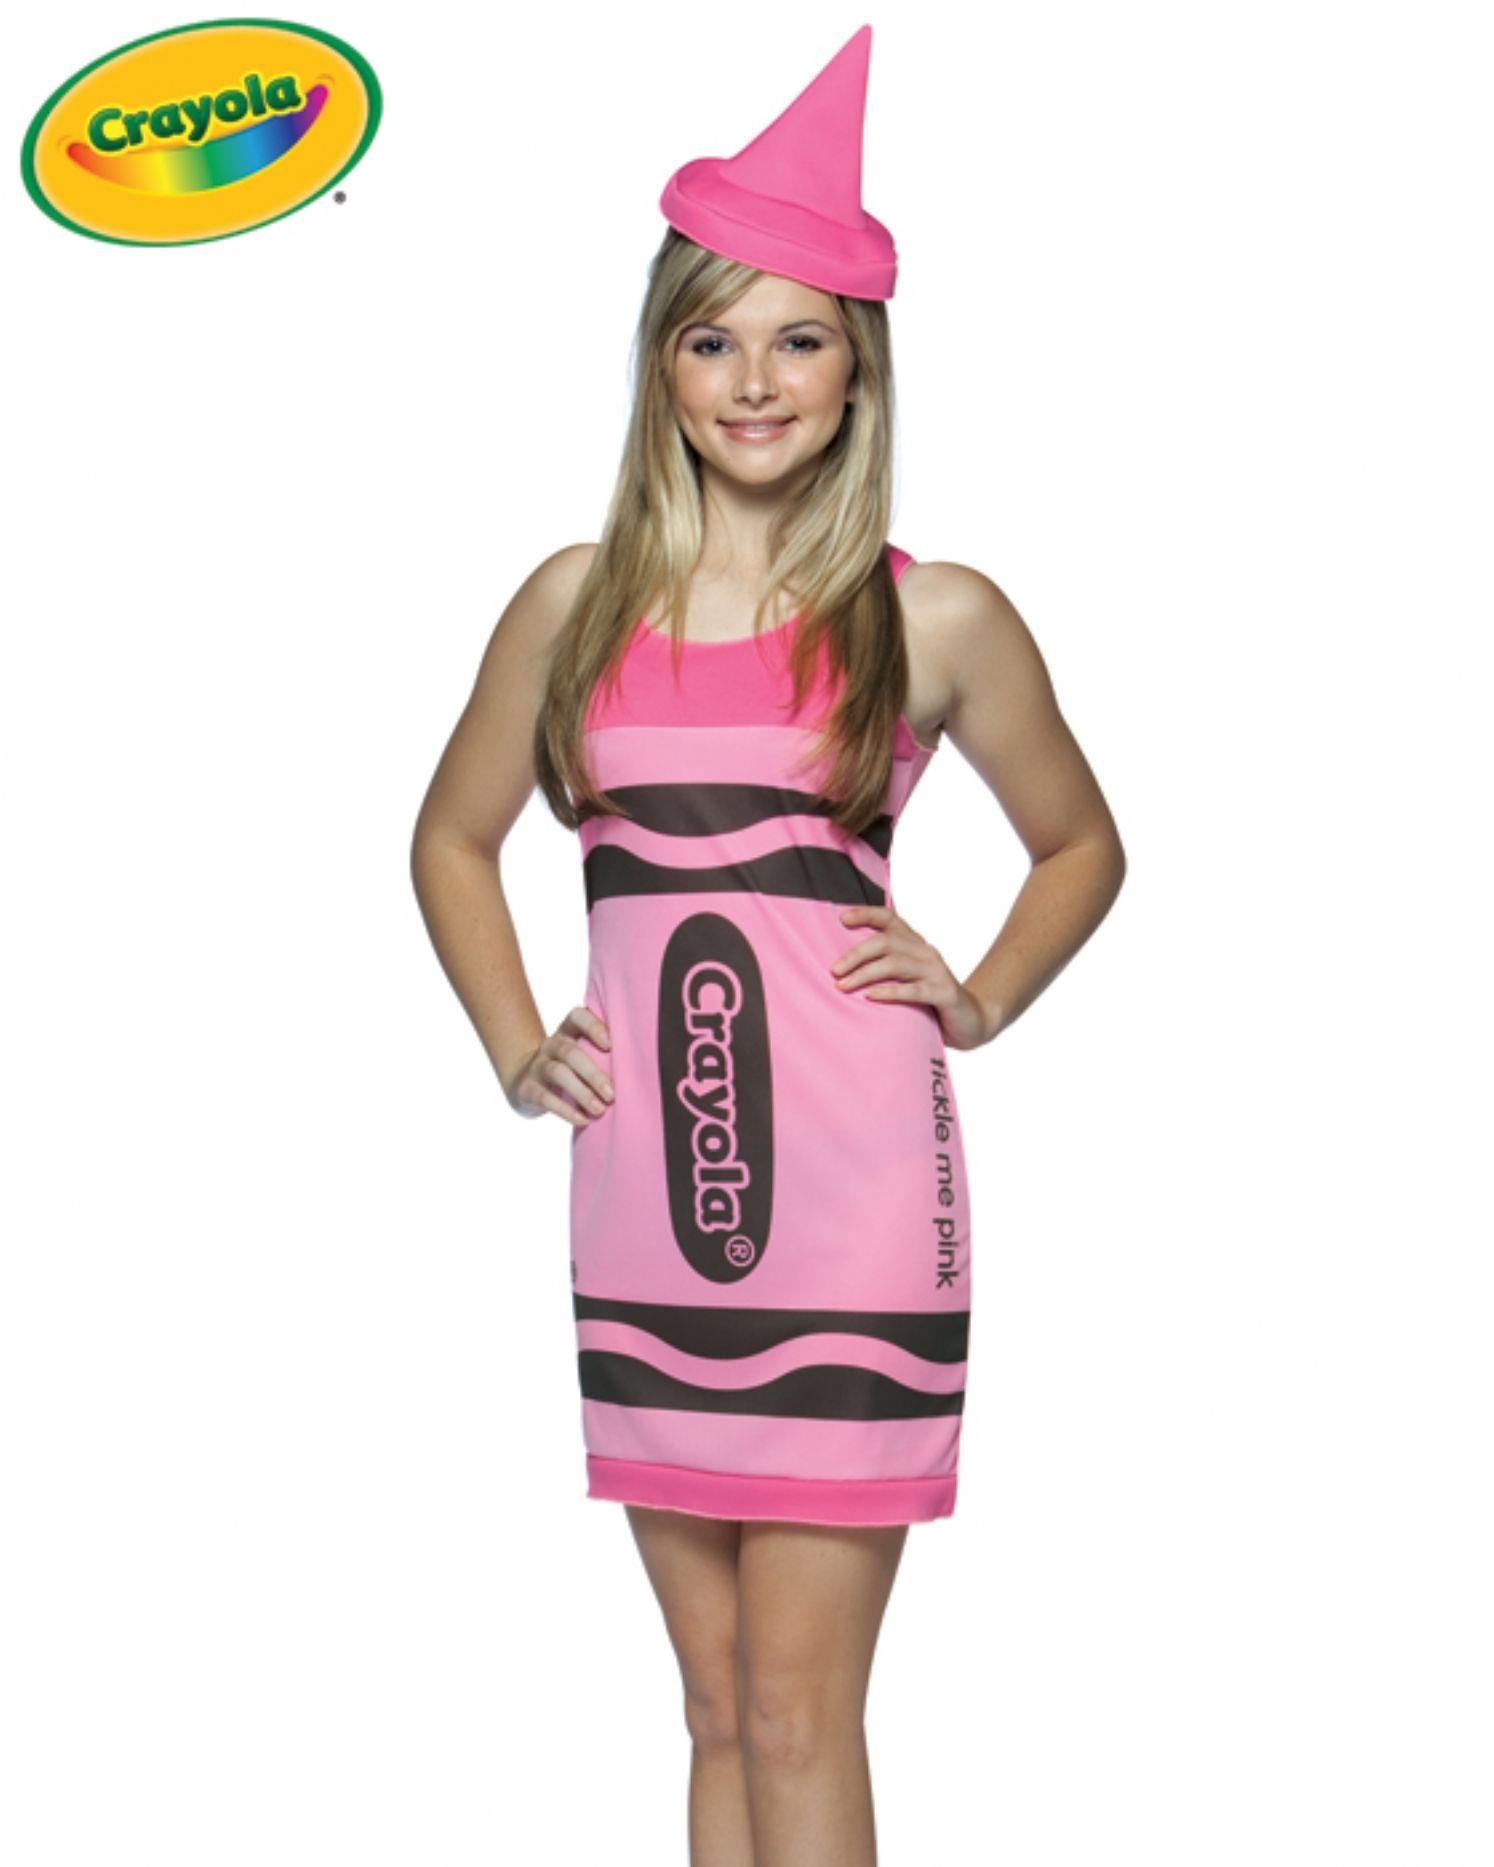 crayola crayon teen halloween costume | halloween | pinterest | teen